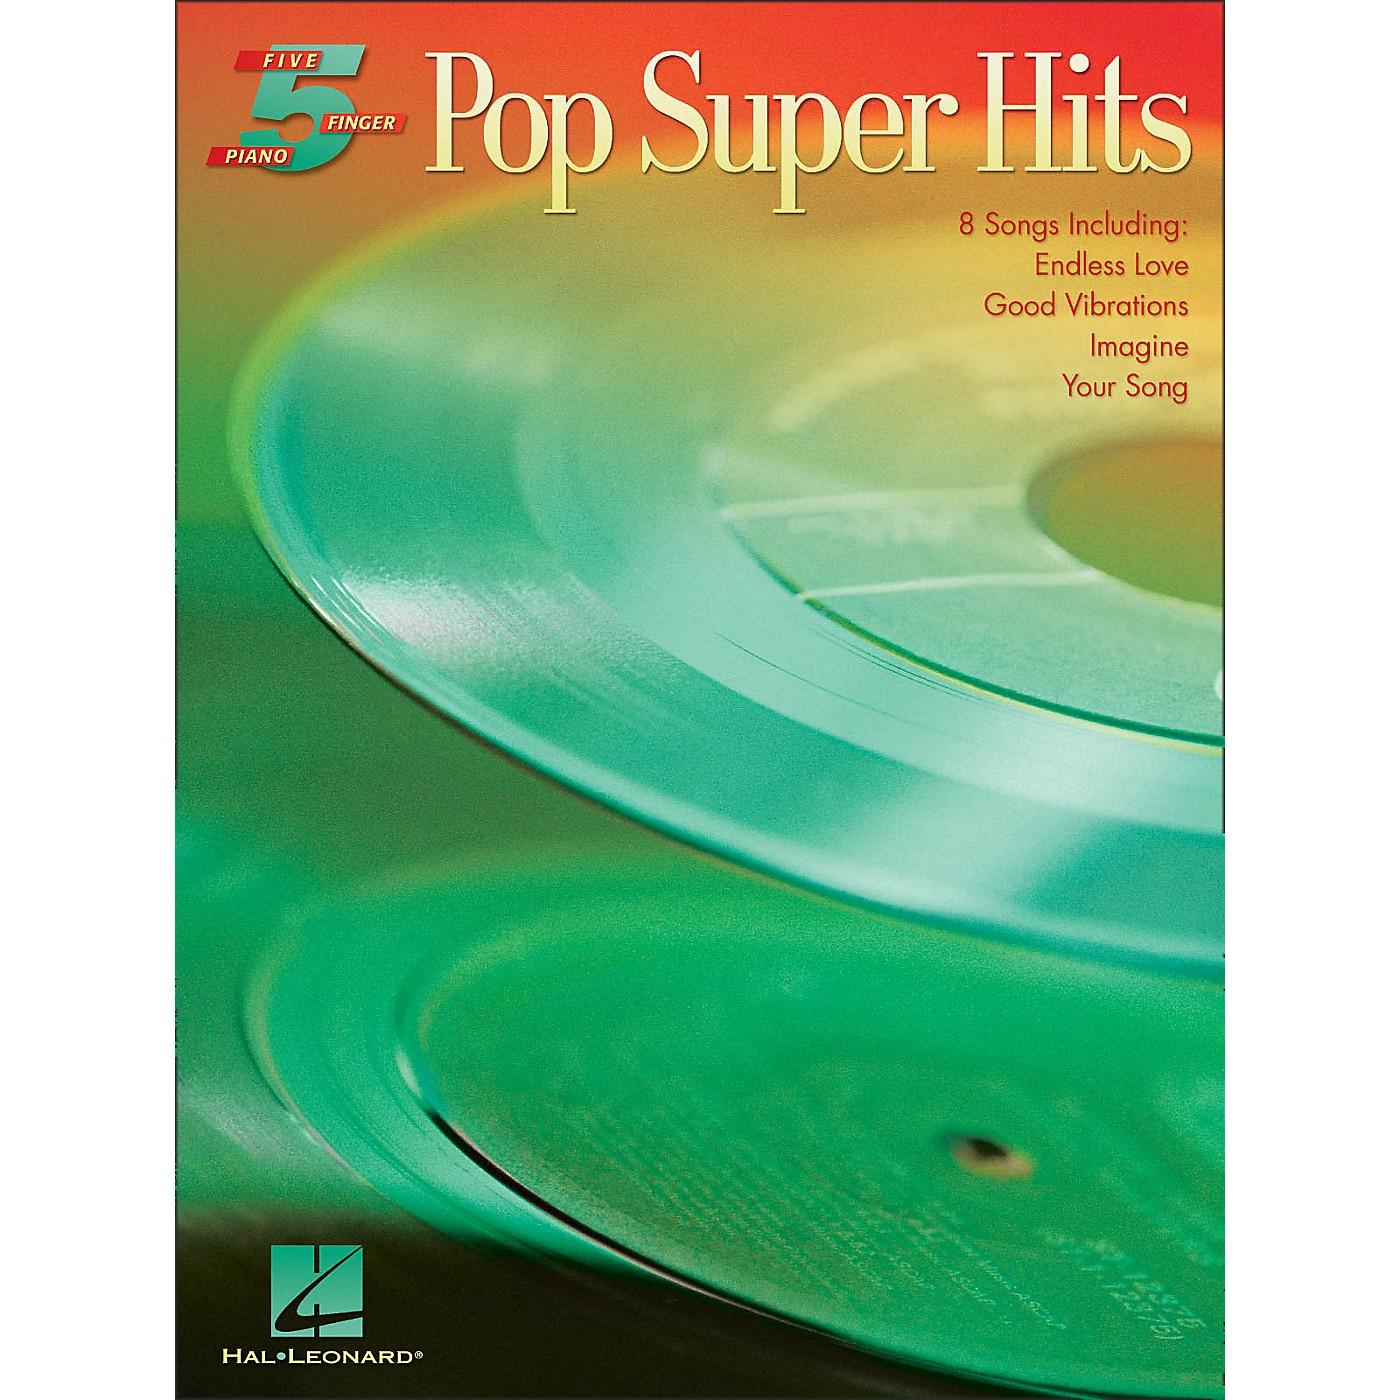 Hal Leonard Pop Super Hits for Five Finger Piano thumbnail